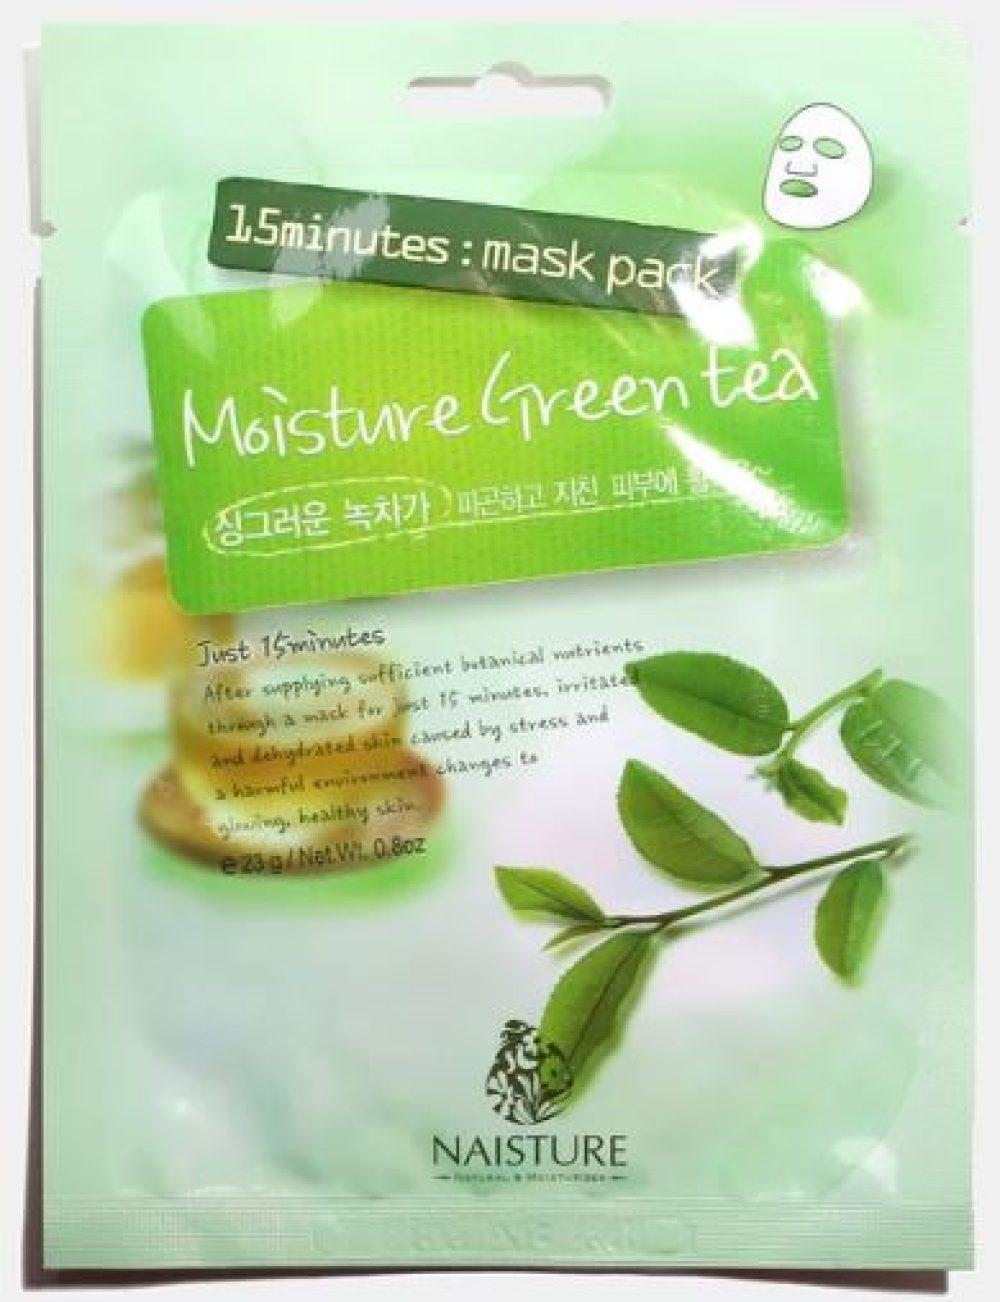 moisture green tea mask pack